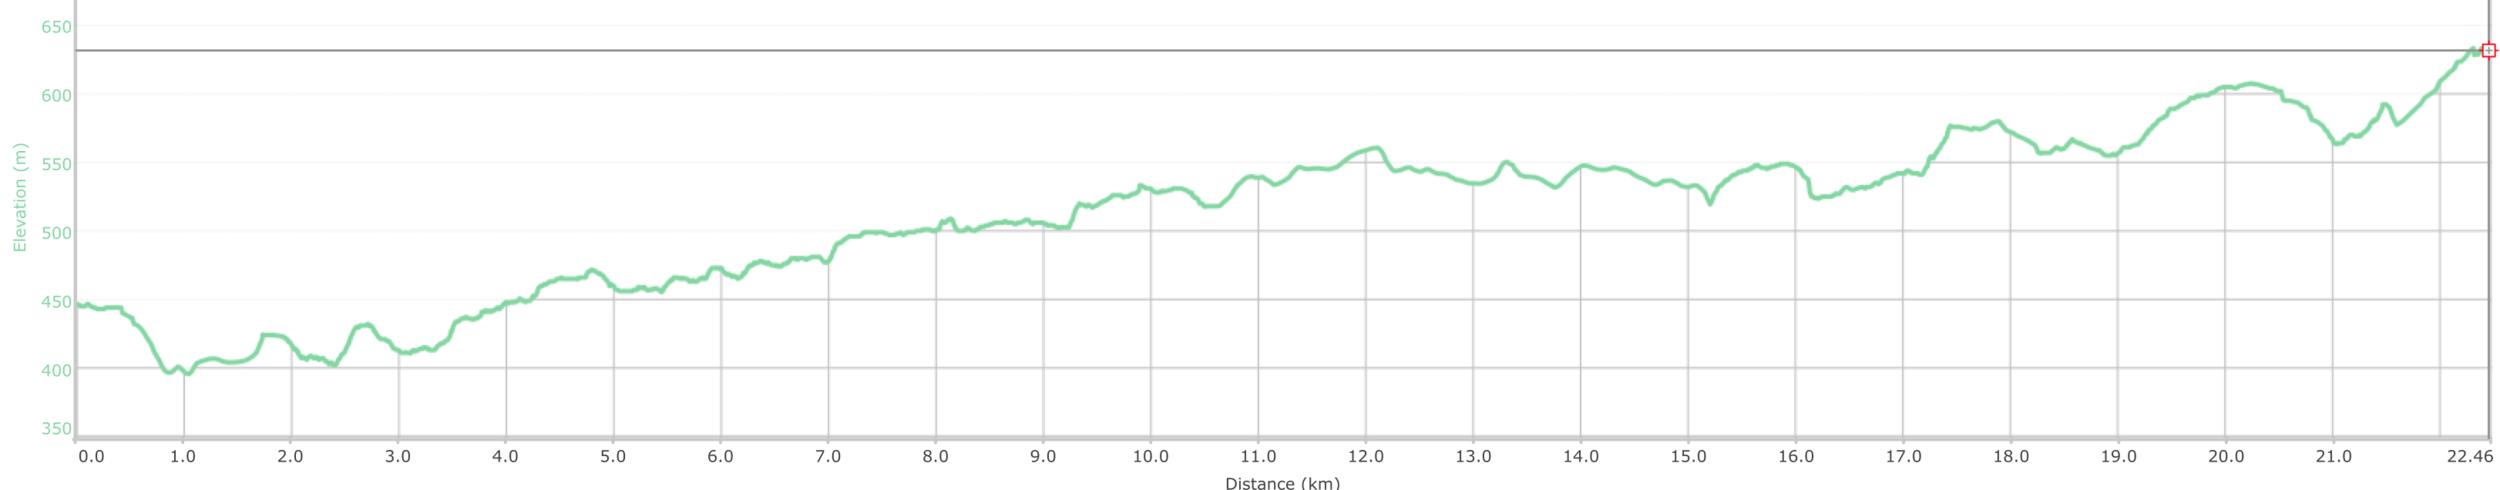 COURSE ELEVATION PROFILE - 24km